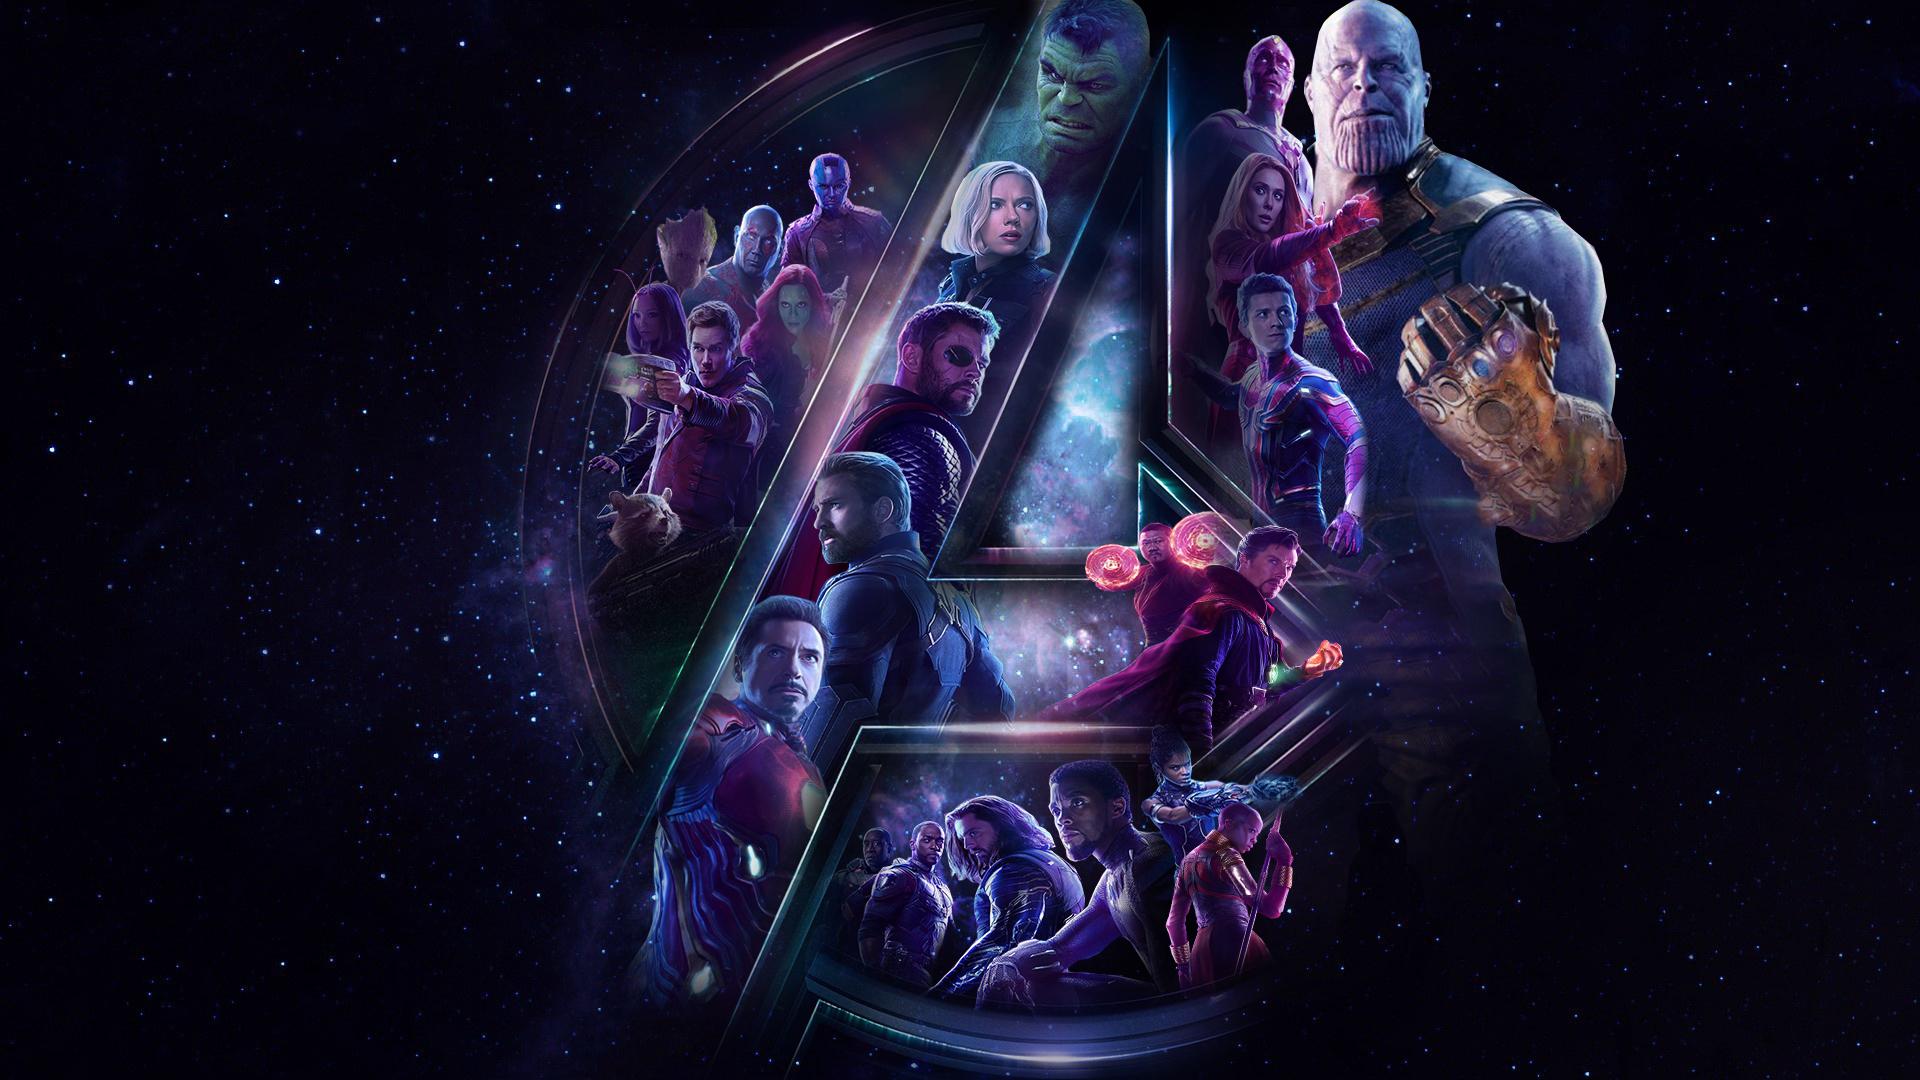 Avengers Infinity War All Superhero And Villain Poster